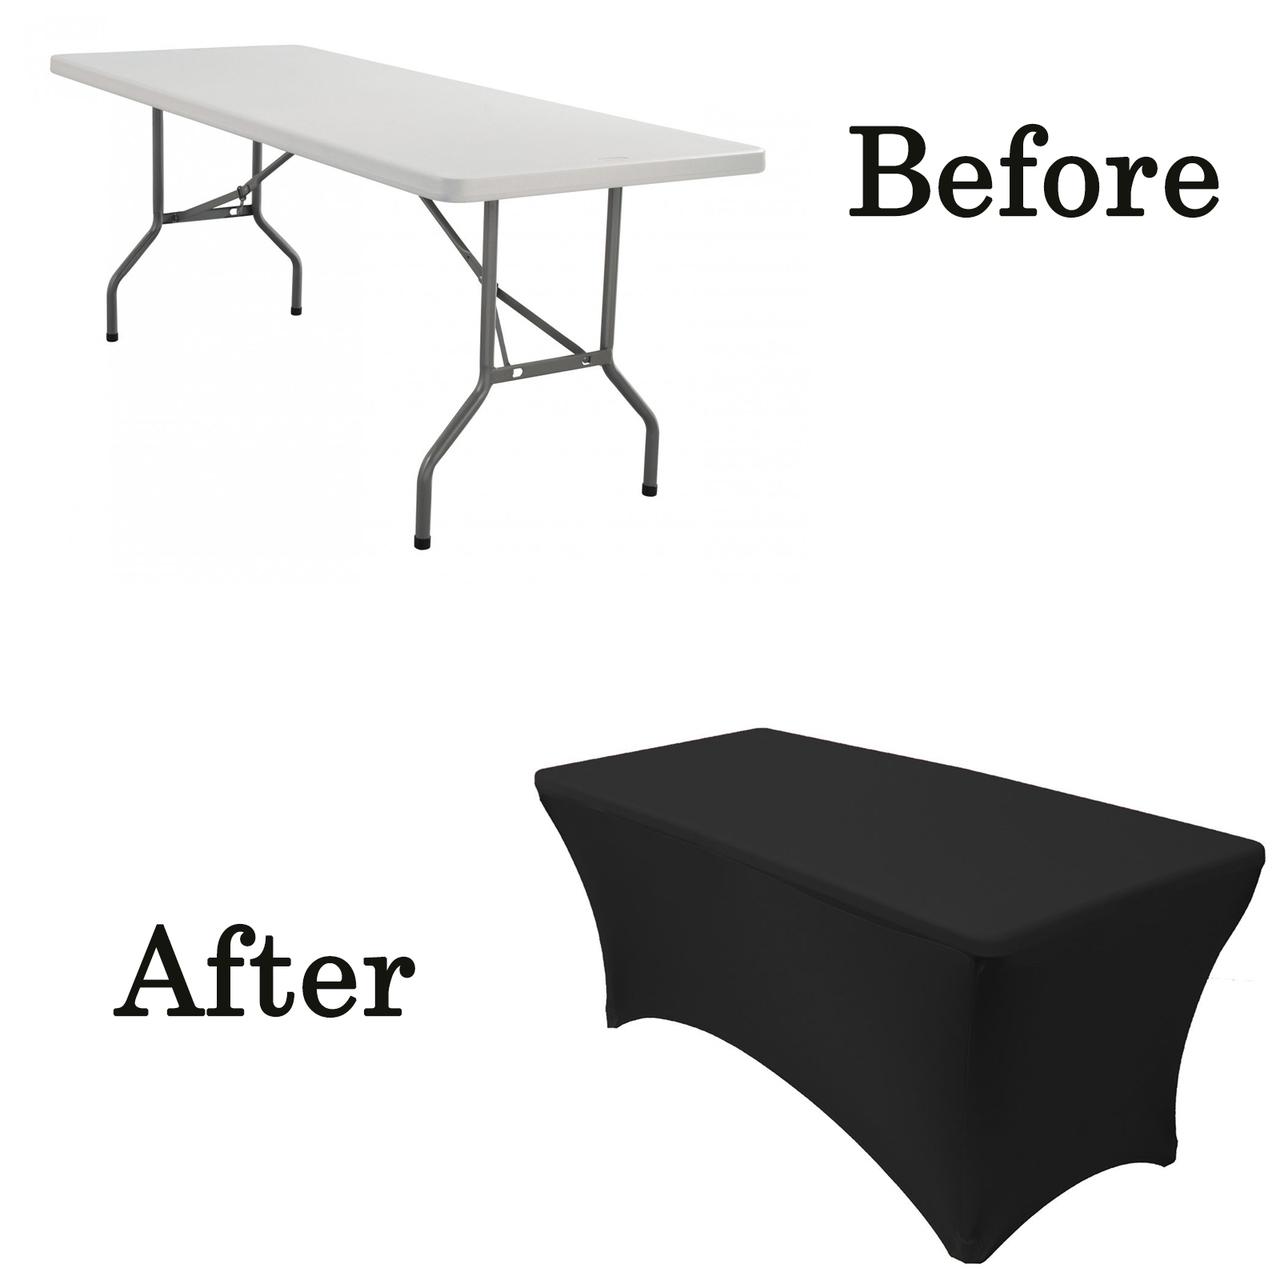 6ft rectangular spandex tablecloth black lifetime folding table covers